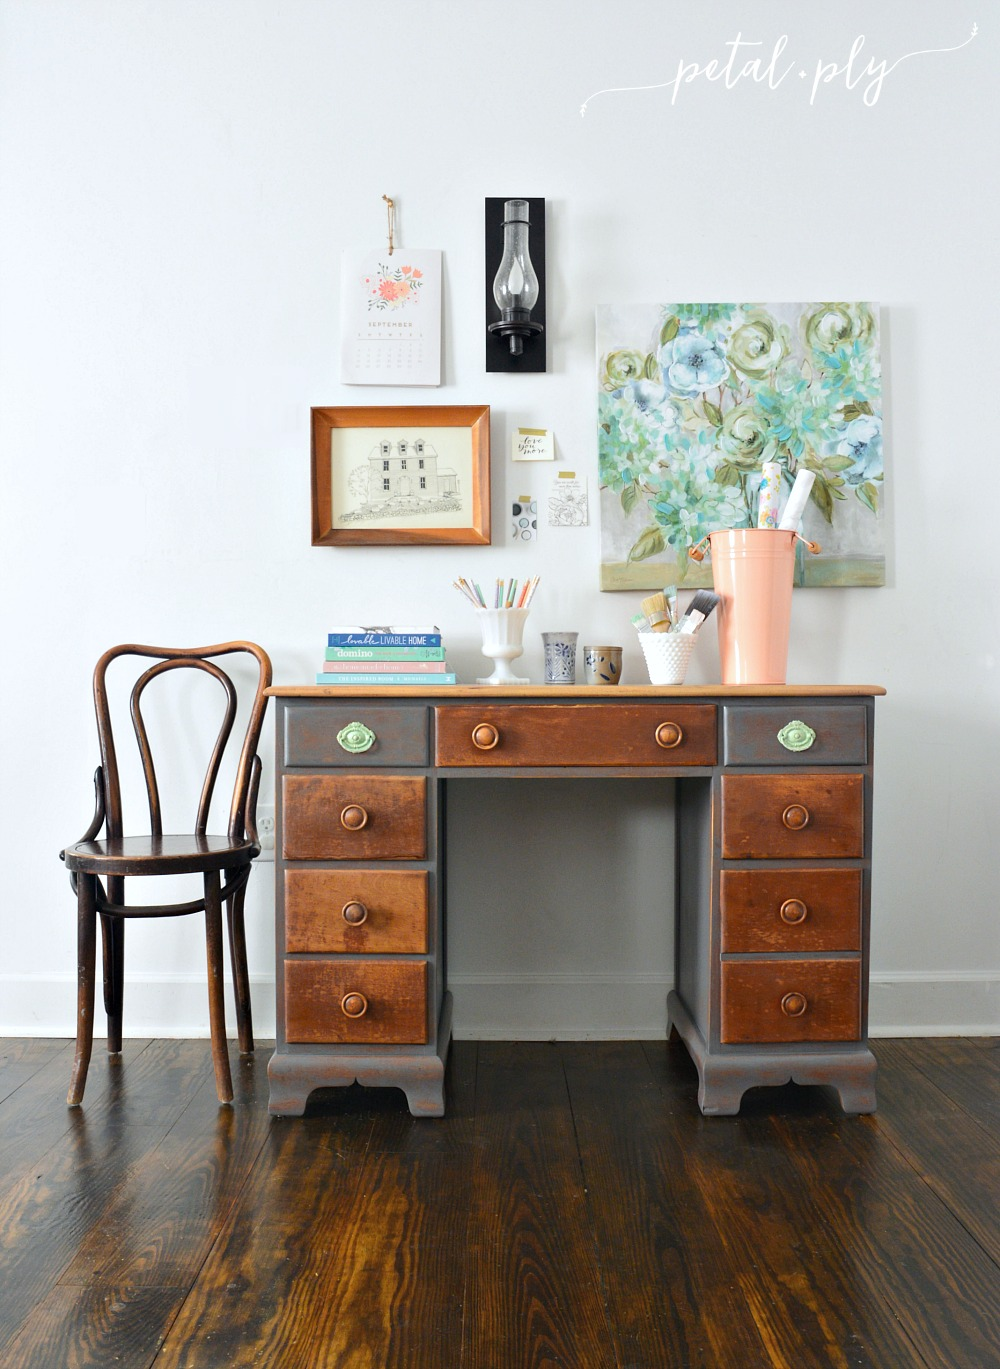 Wm Driftwood Painted Two Tone Desk Redo